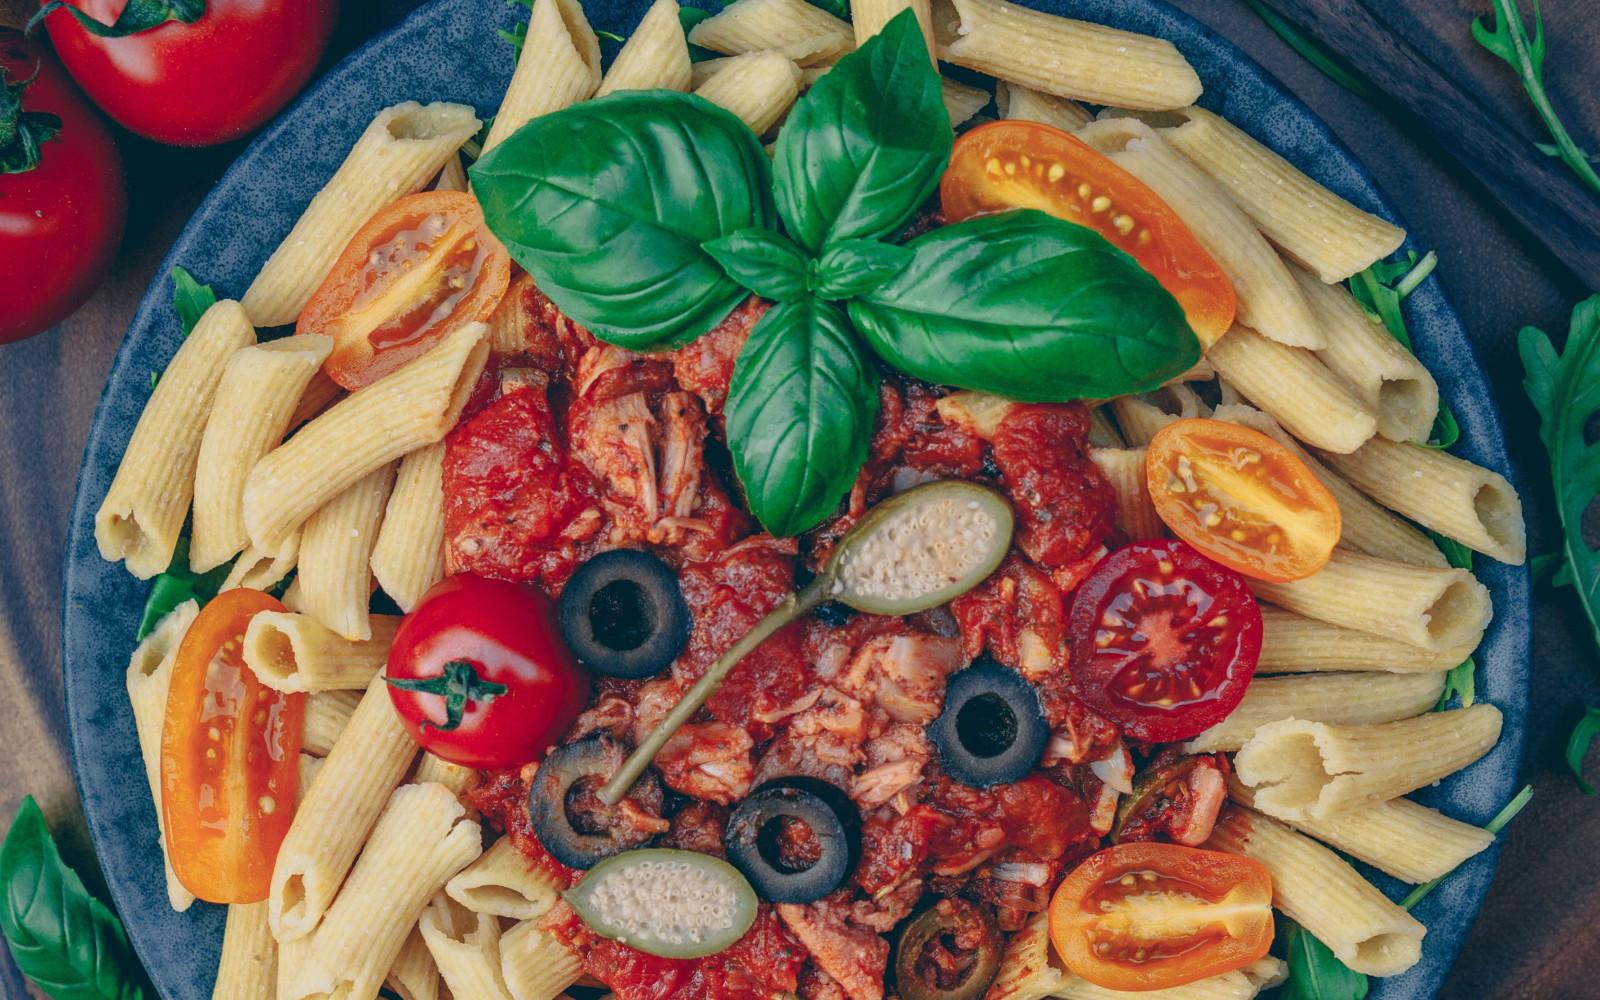 Vegan Pasta Al Tonno: Italian Jackfruit 'Tuna' Pasta